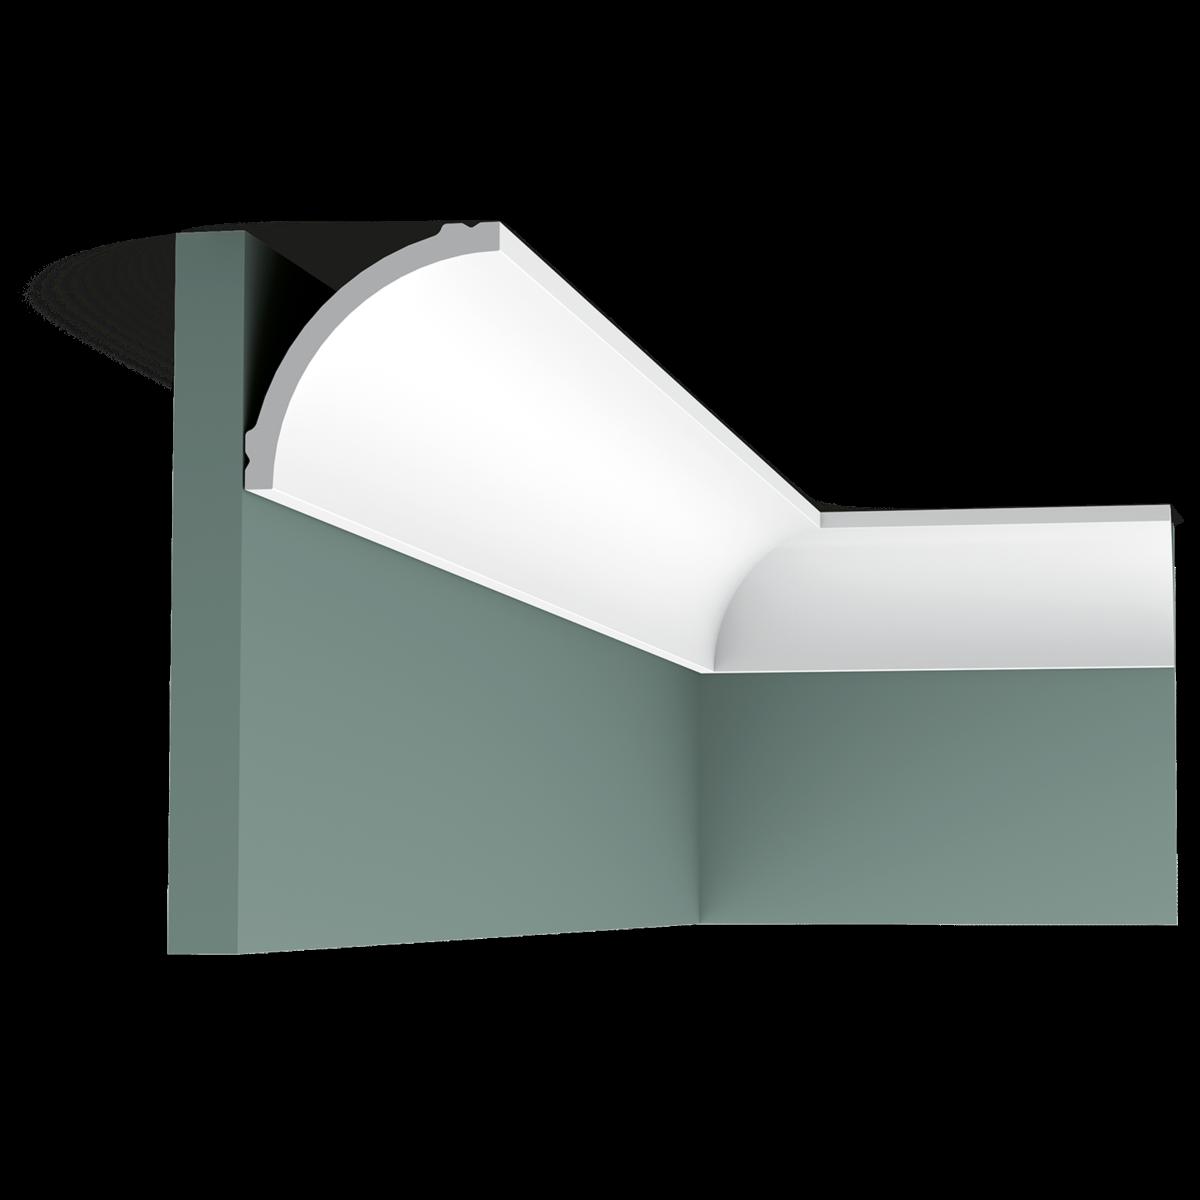 Corniche Polystyrène Pour Led cb524 carton complet de 32 m de corniches plafond orac decor polystyrène -  9x9x200cm (h x p x l)